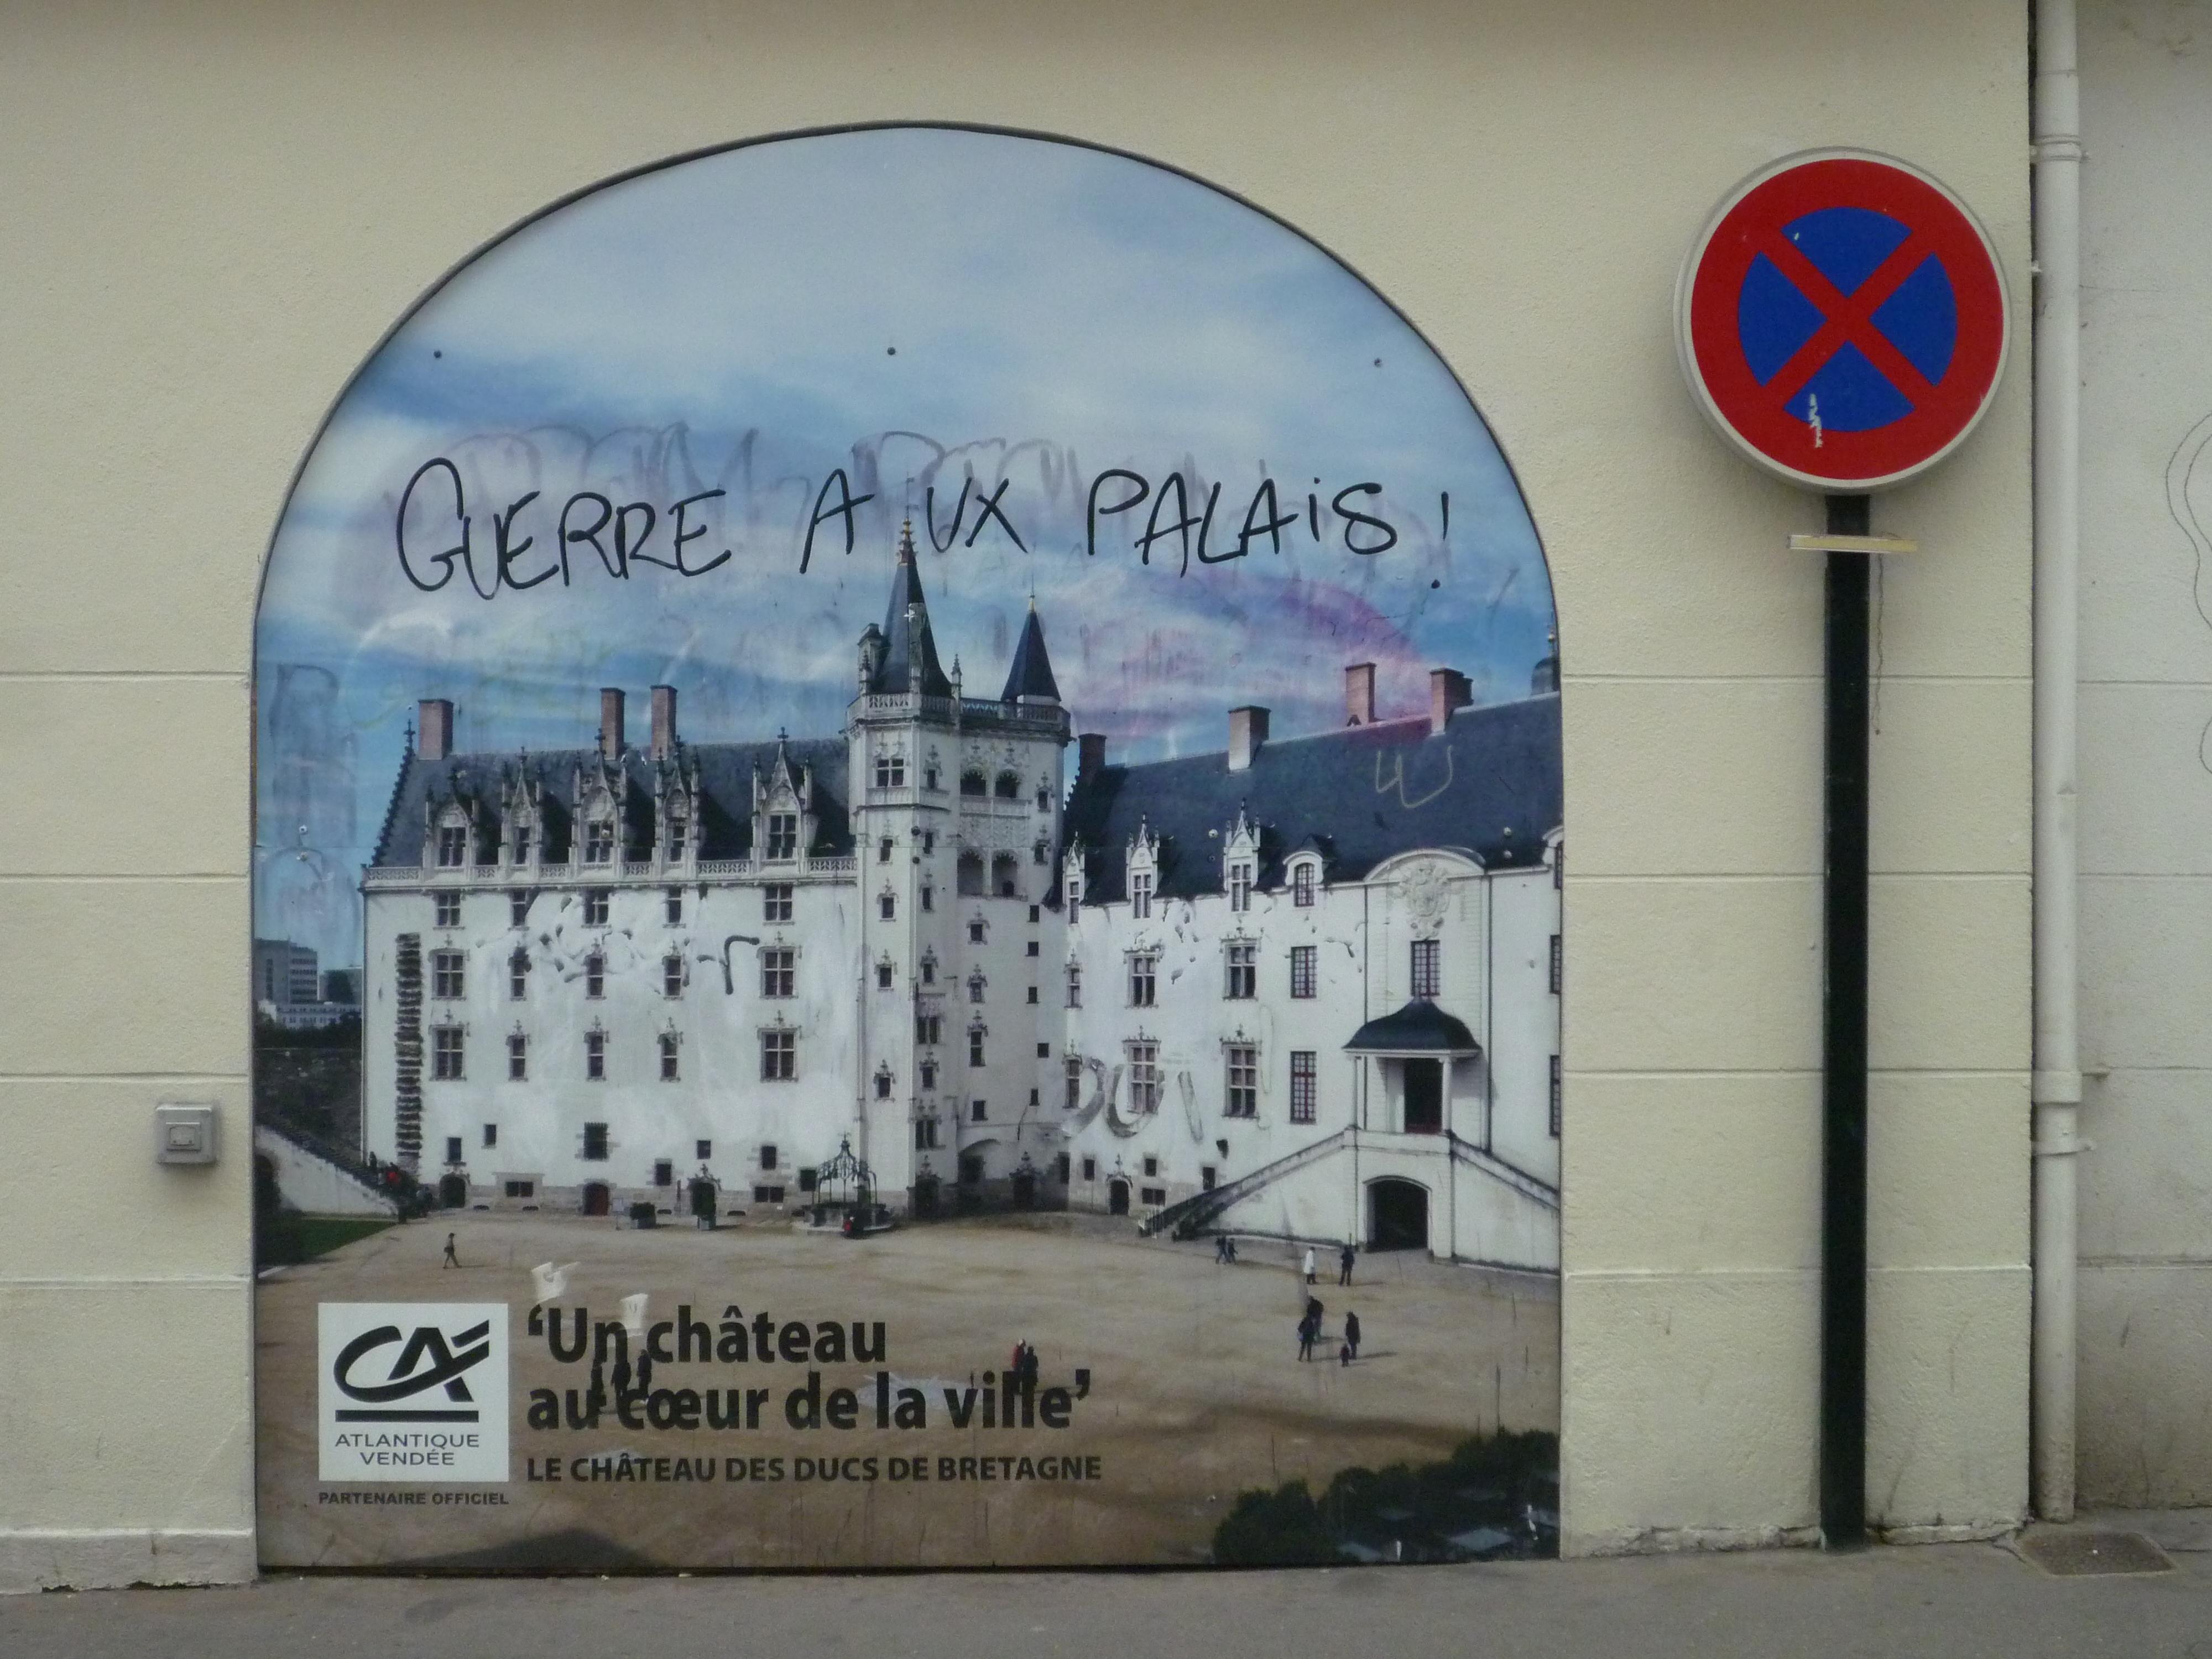 PLAN CUL GAY LOIRET PLAN CUL SUR PARIS